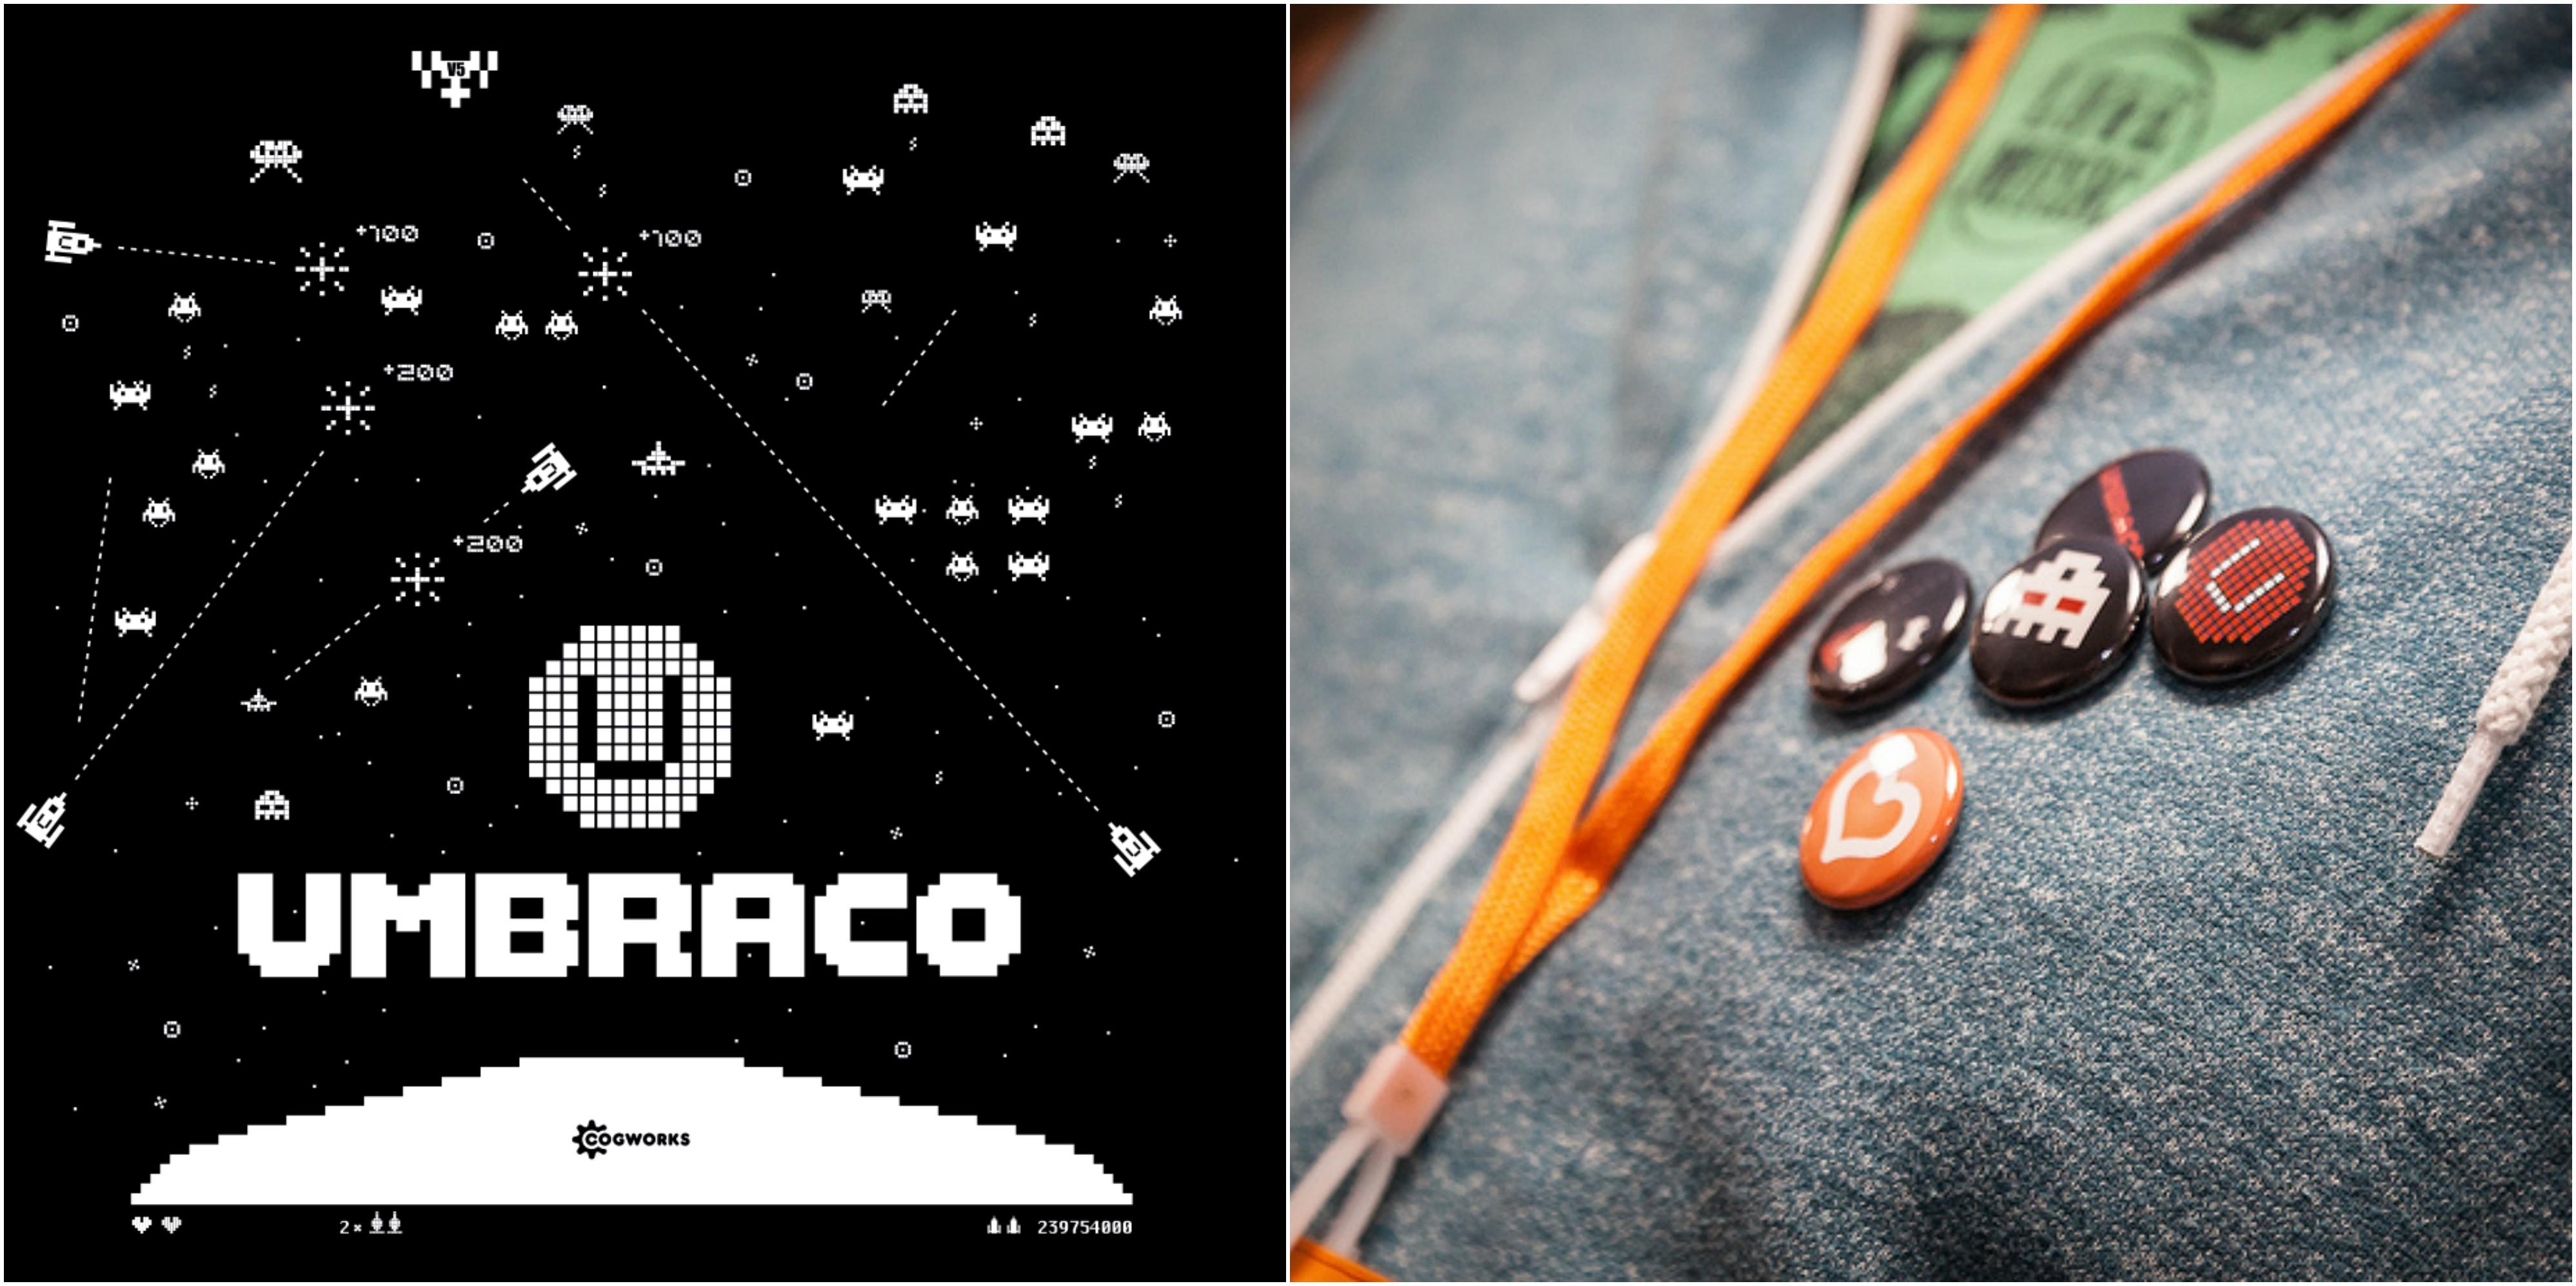 Umbraco UK Festival design 2012